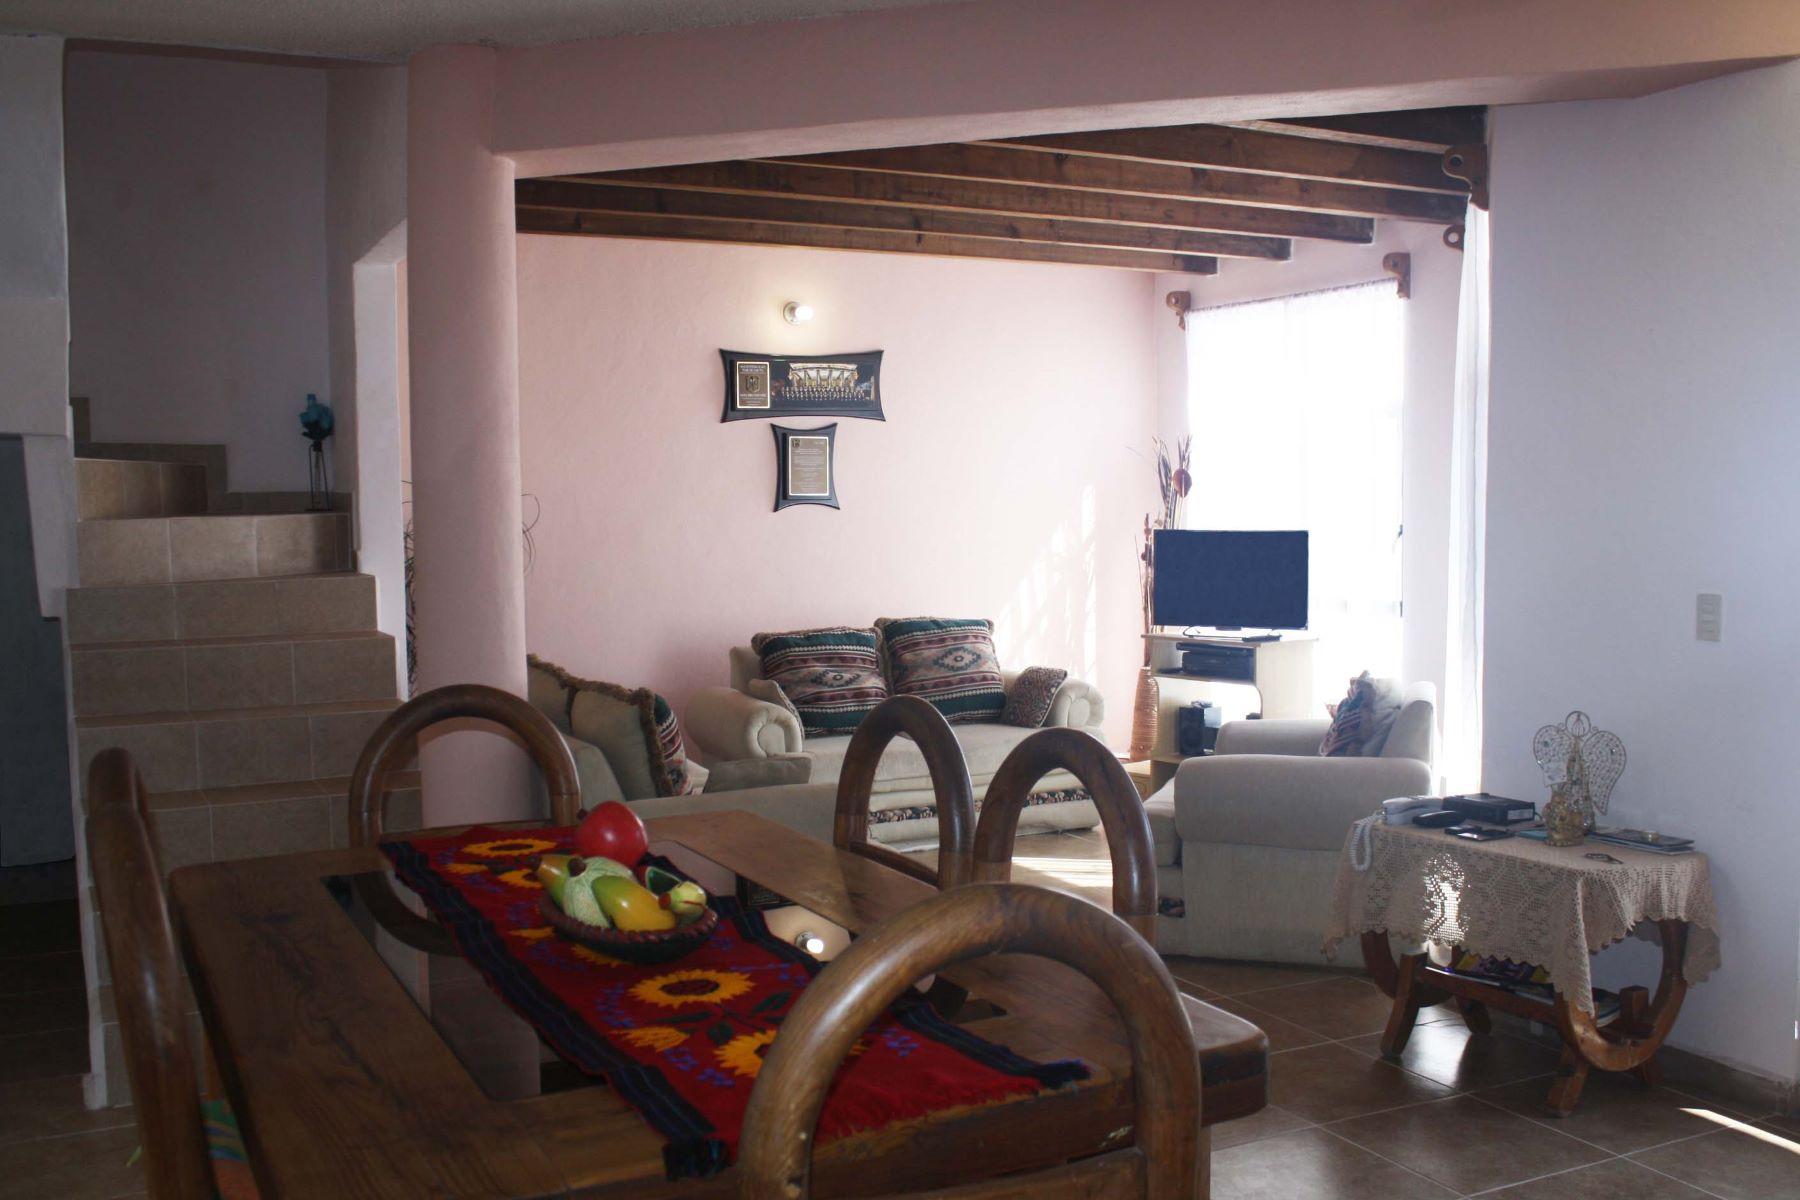 Additional photo for property listing at Casa Mexicana Calderón San Miguel De Allende, Guanajuato 37712 Mexico